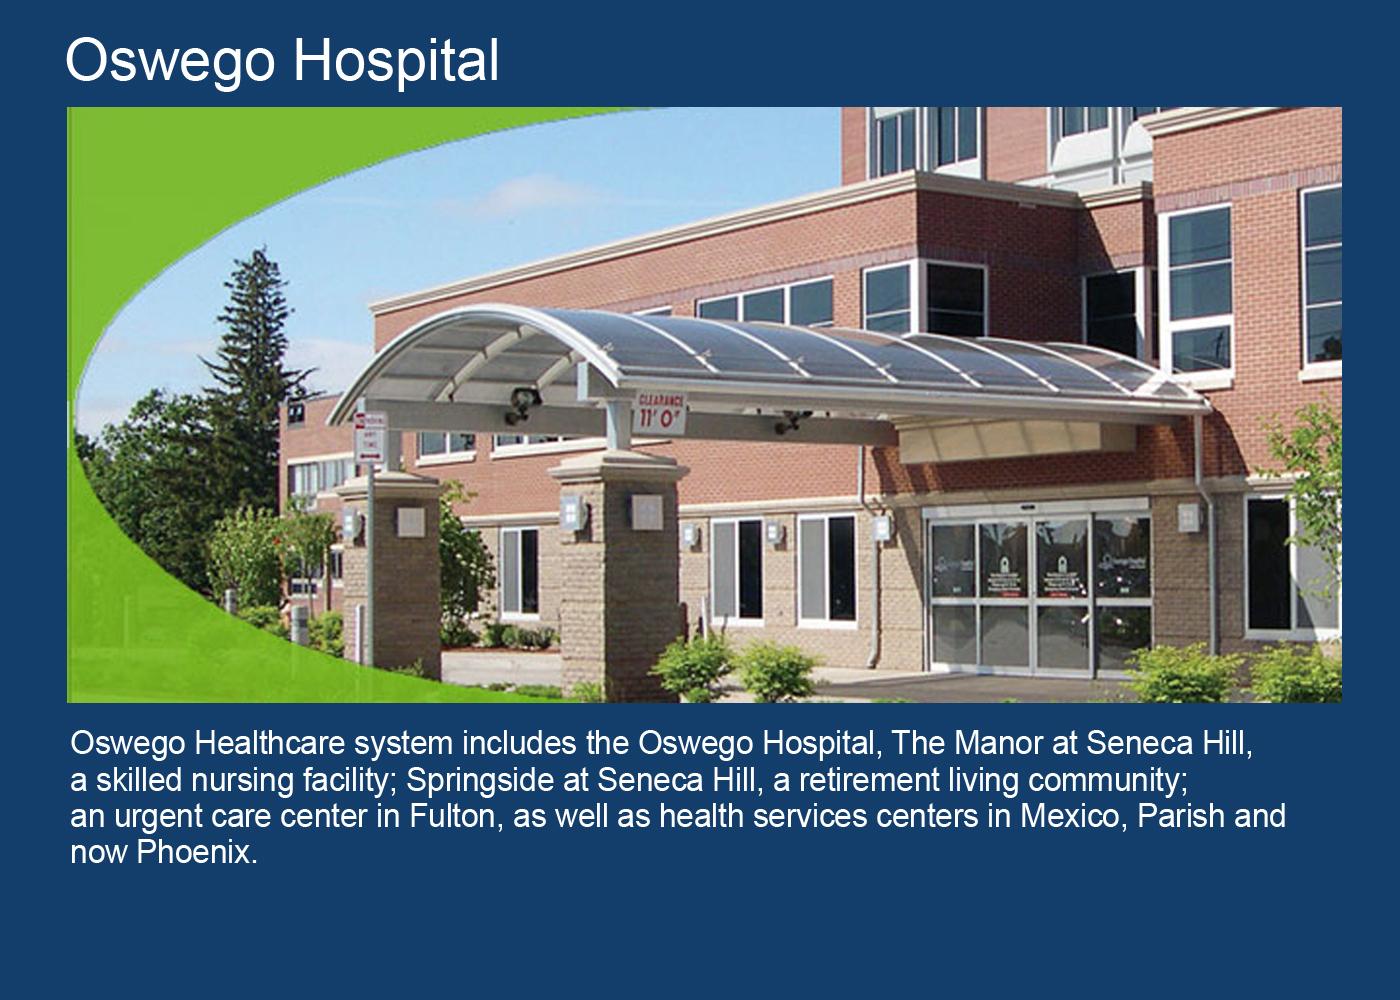 Oswego Hostpital